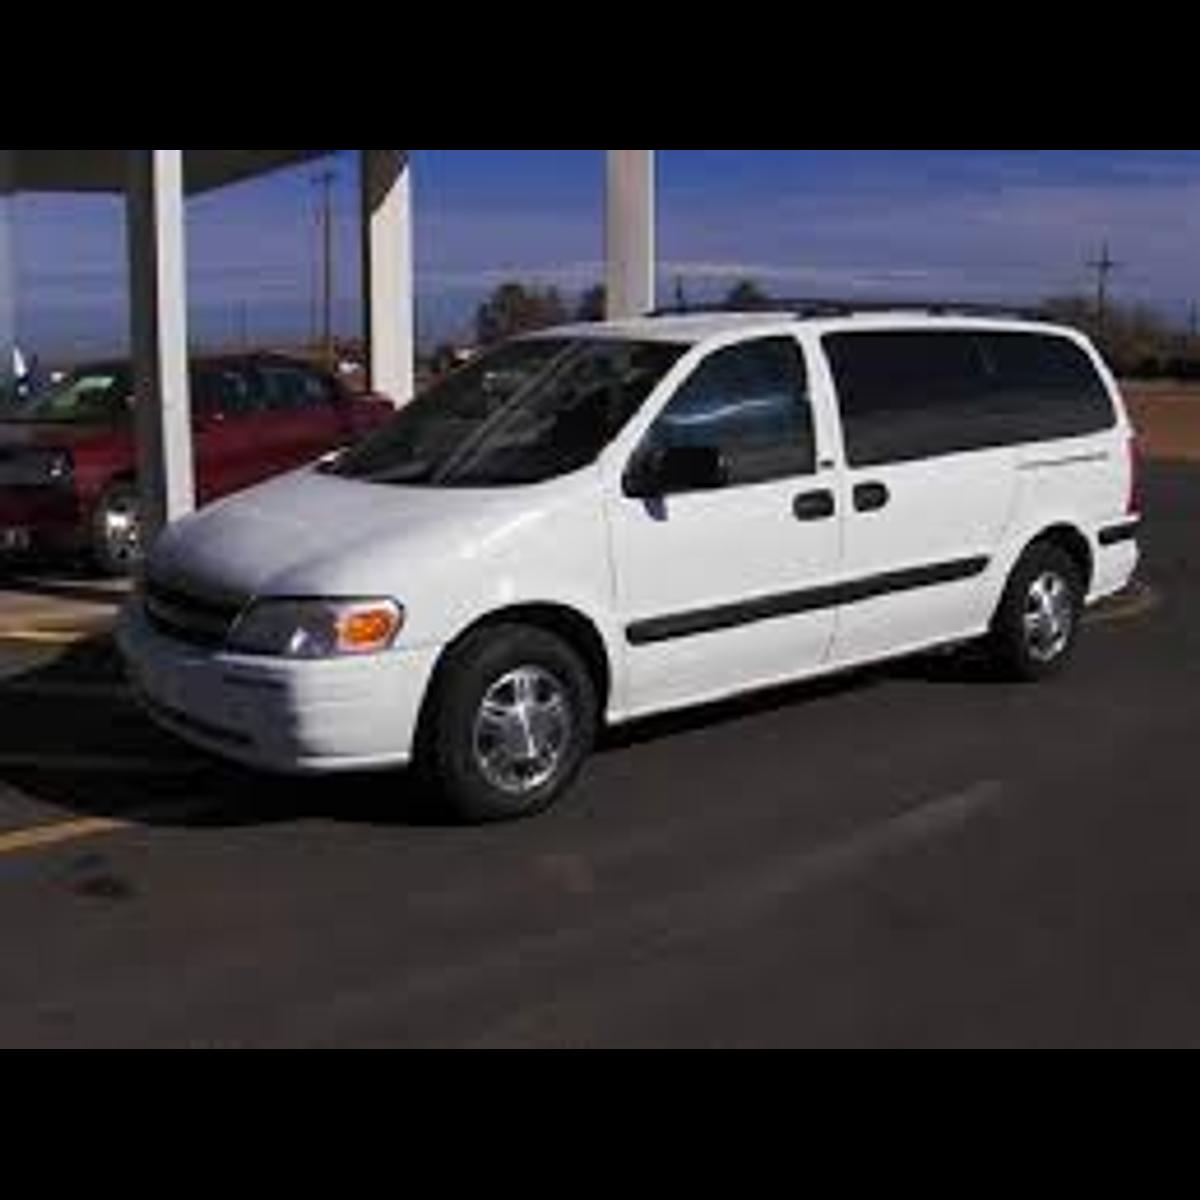 1997 Chevrolet Venture Passenger Transmission: Manual De Taller Chevrolet Venture (1997-2005) Español